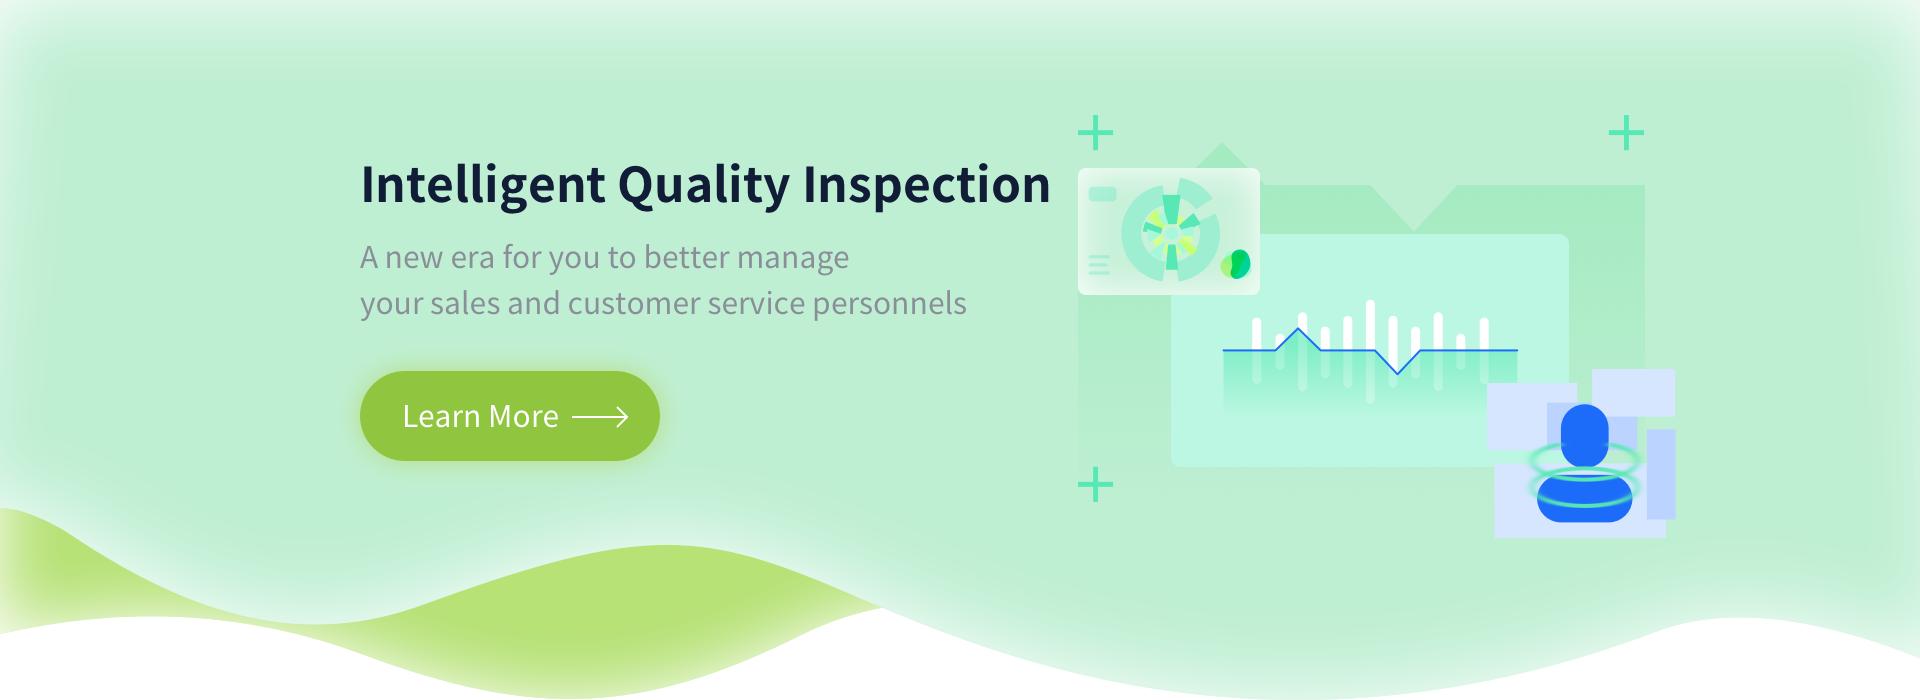 Intelligent quality inspection